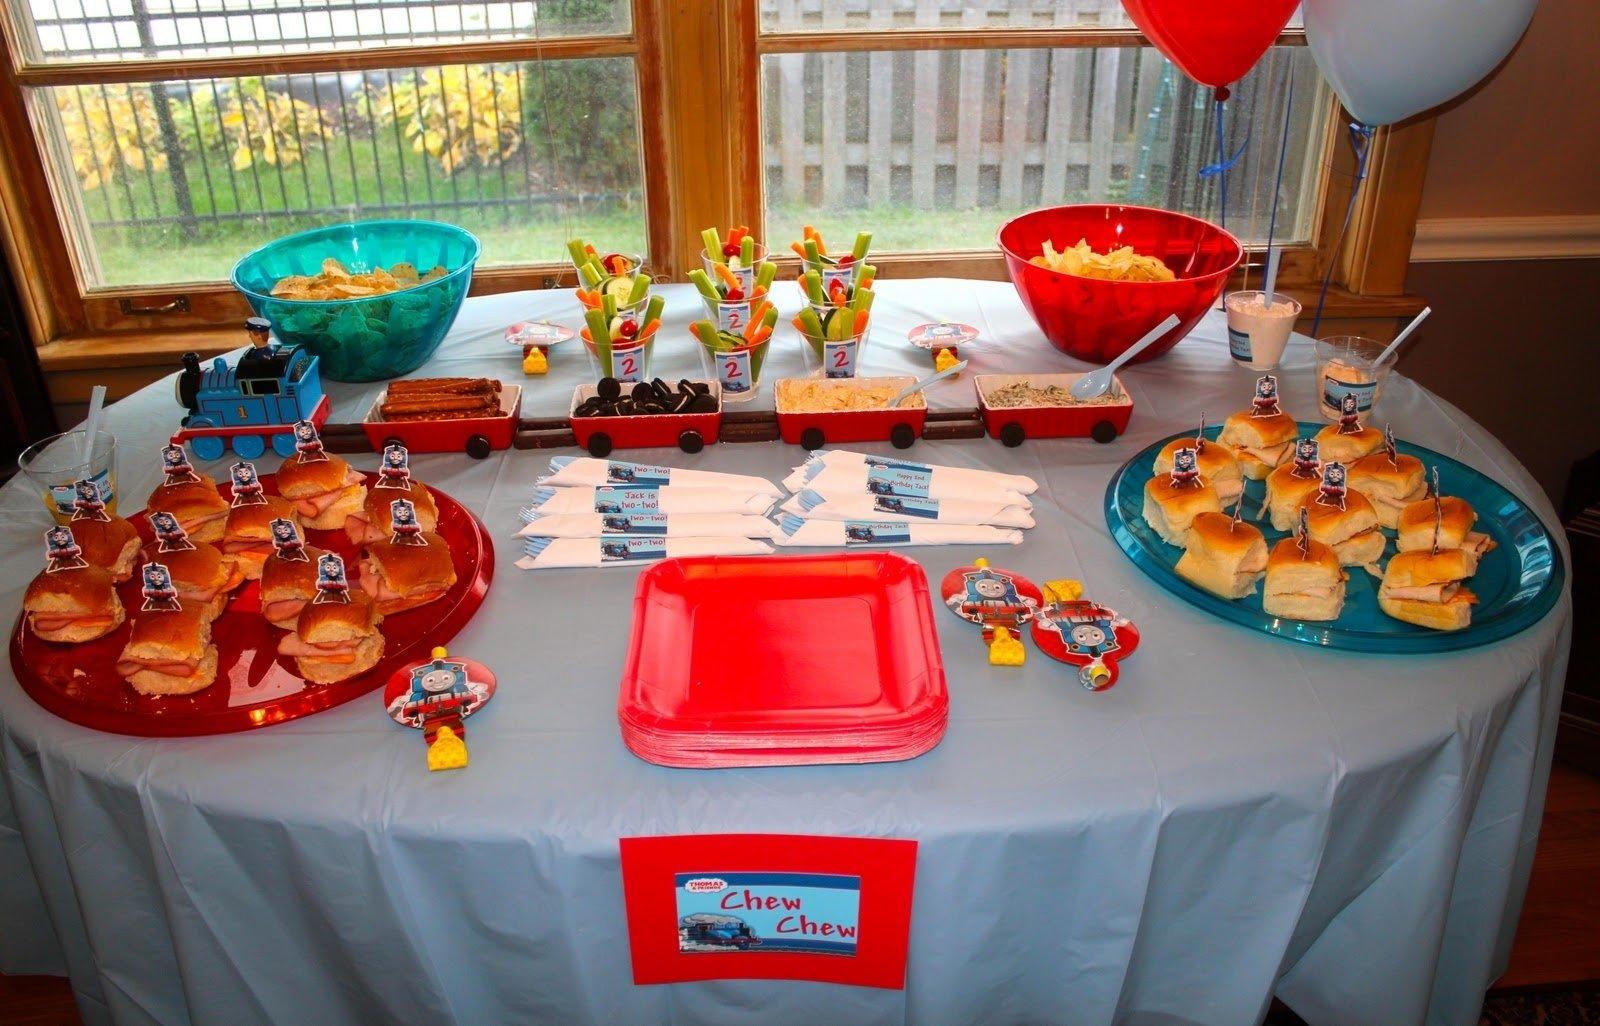 10 Fabulous Thomas The Train Party Food Ideas choo choo train birthday party 2021